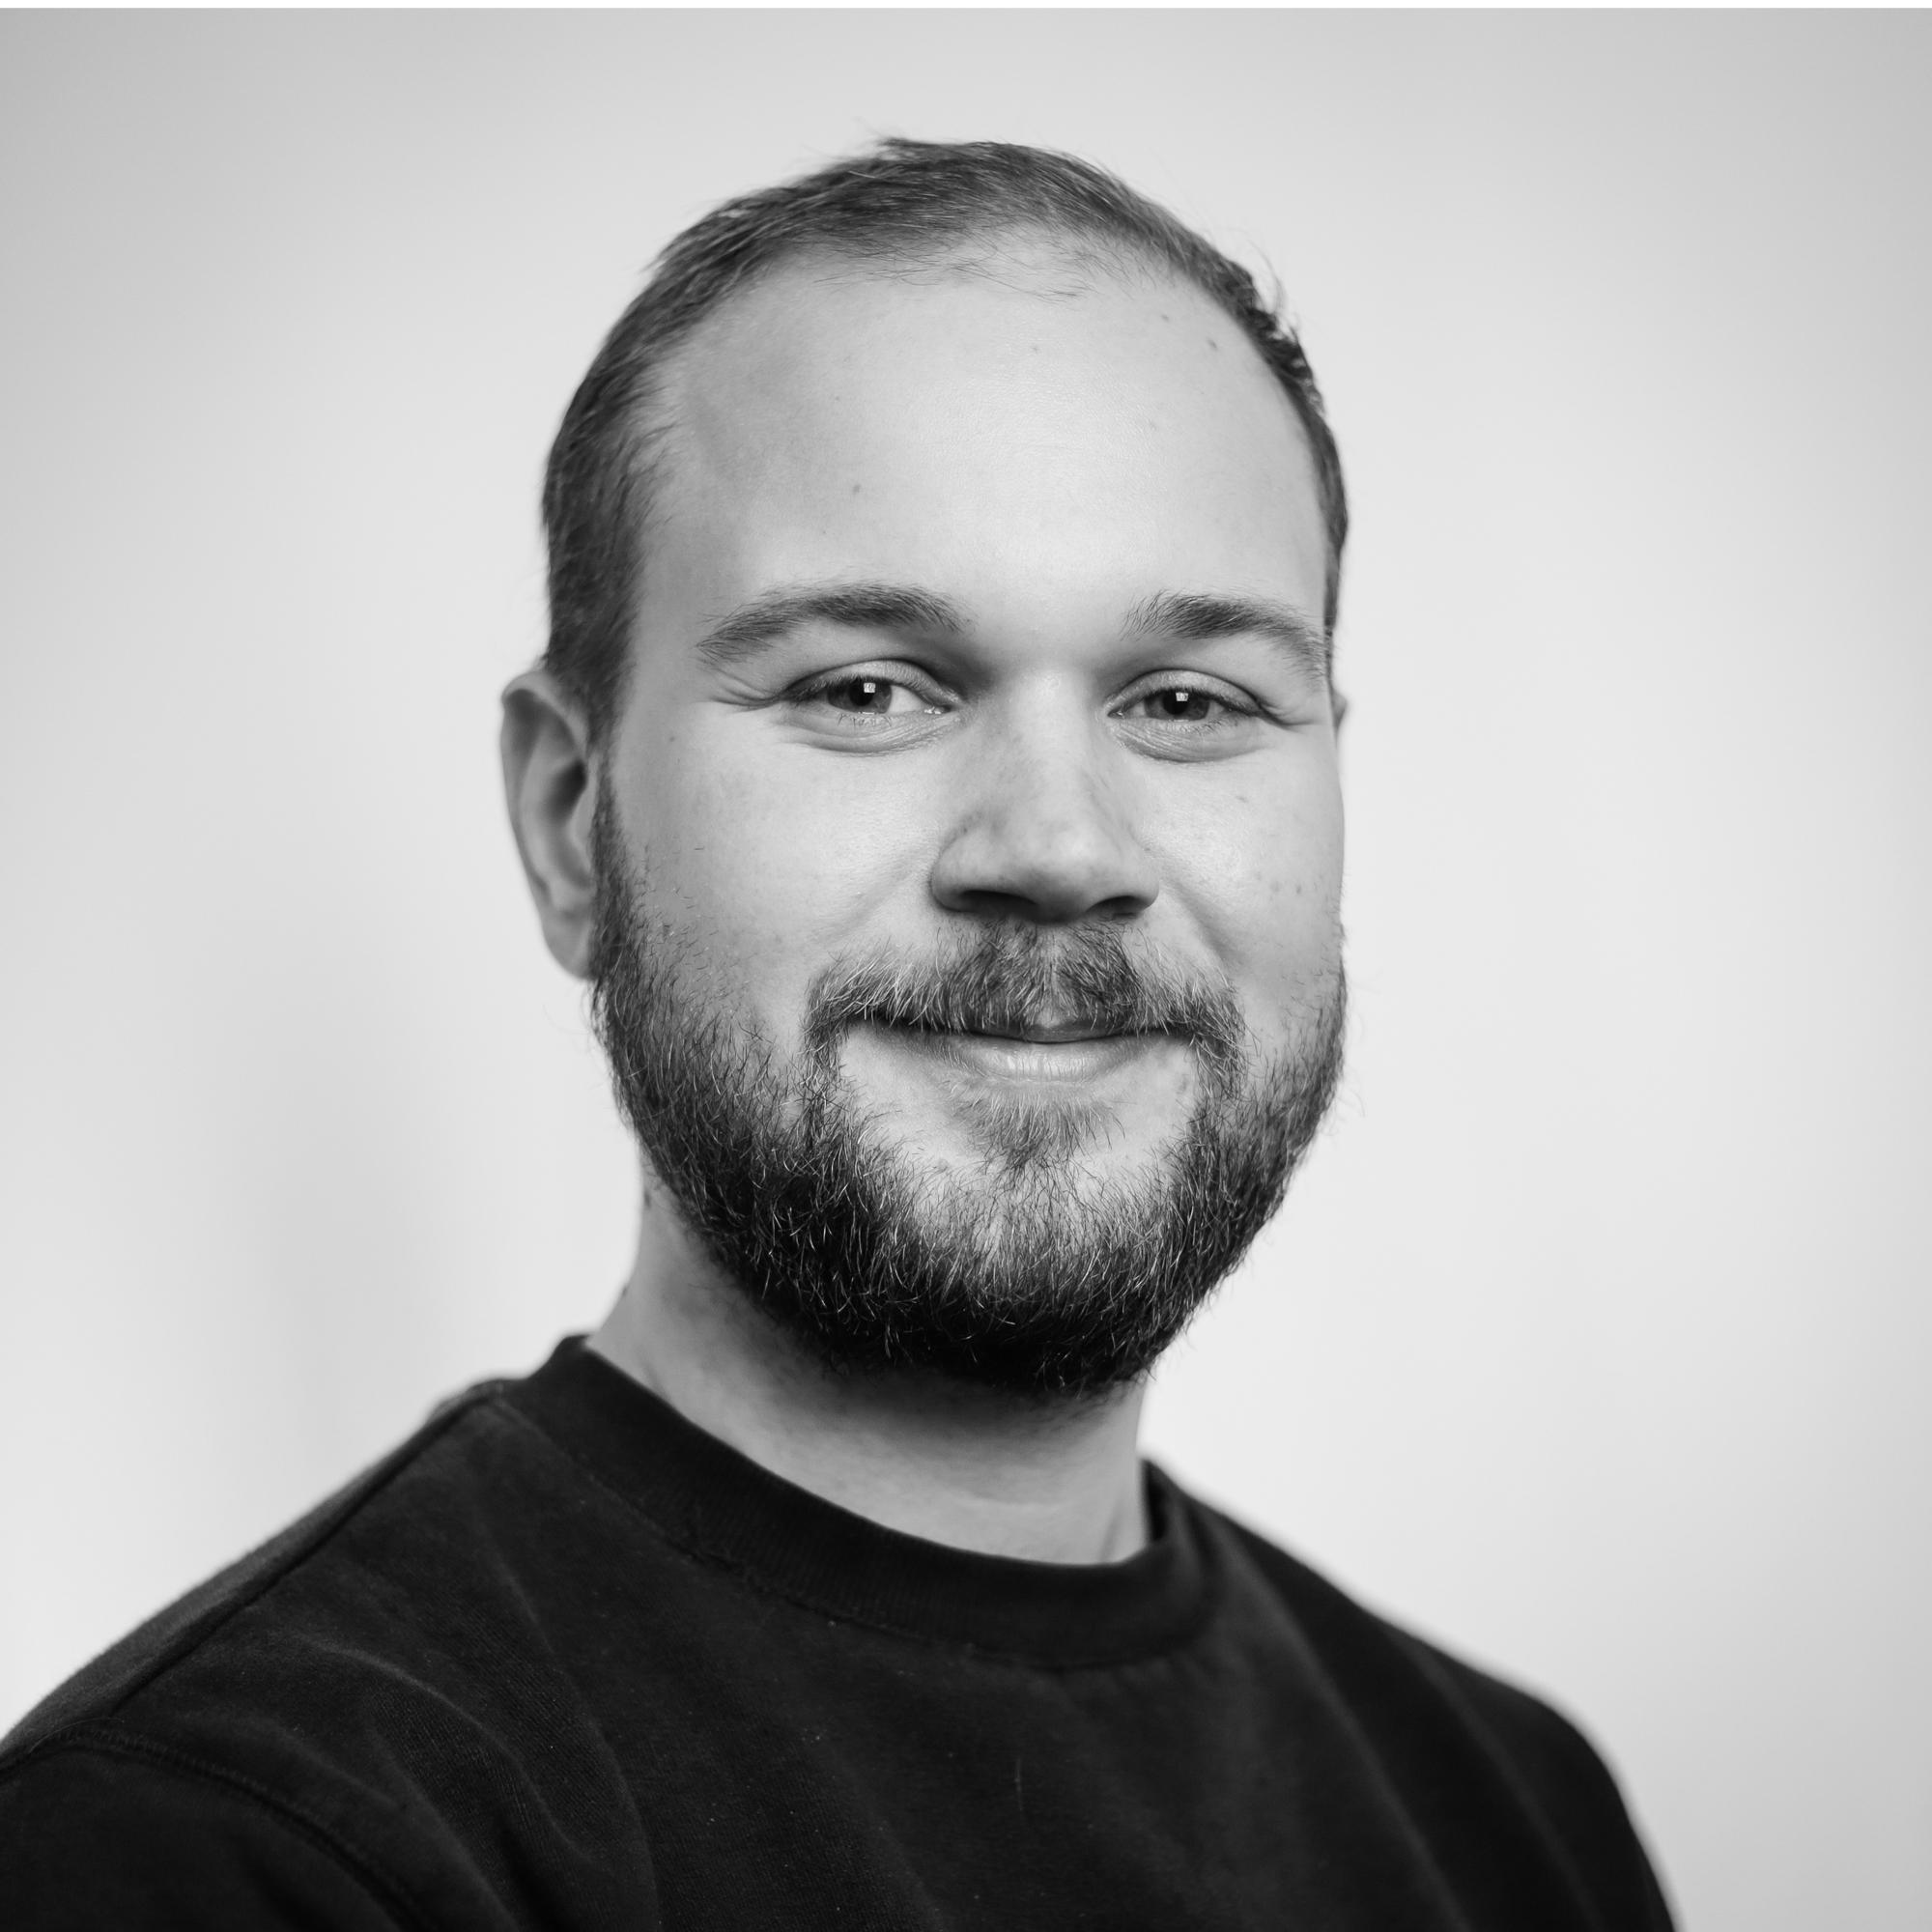 Markus Ødegård Raknestangen